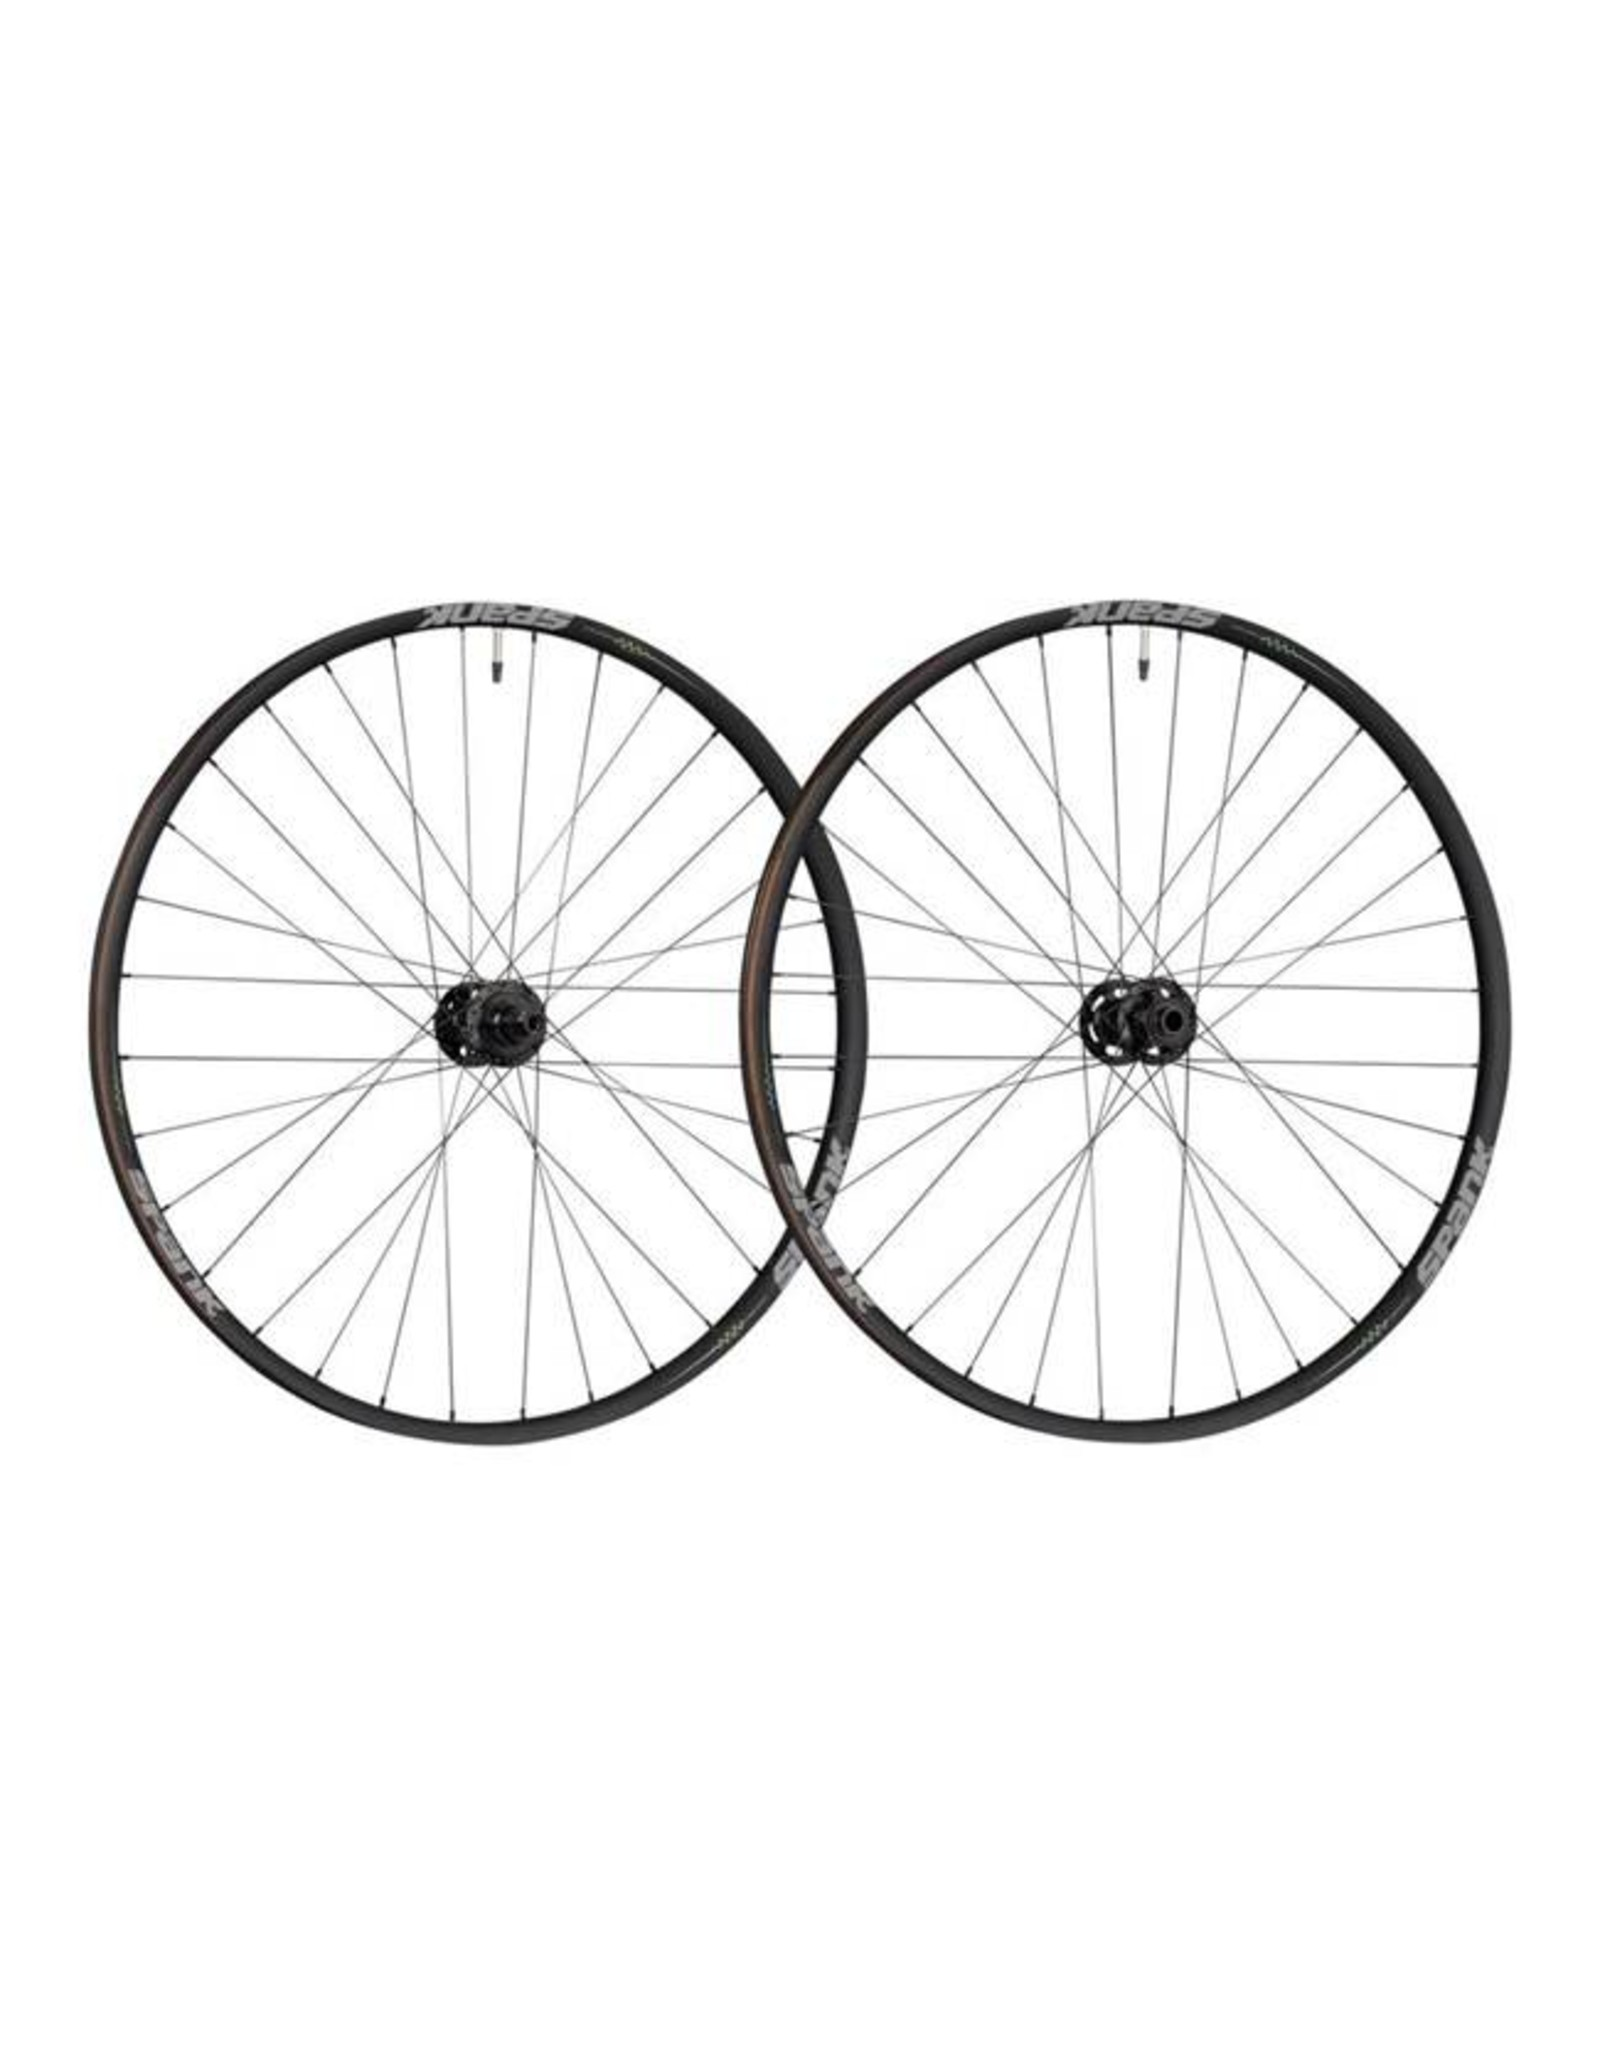 "Spank Spank Spike 350 Vibrocore Boost Wheelset: 29"" 15 x 110mm Front 12 x 148mm Rear Shimano 10/11 MTB Freehub, Black"